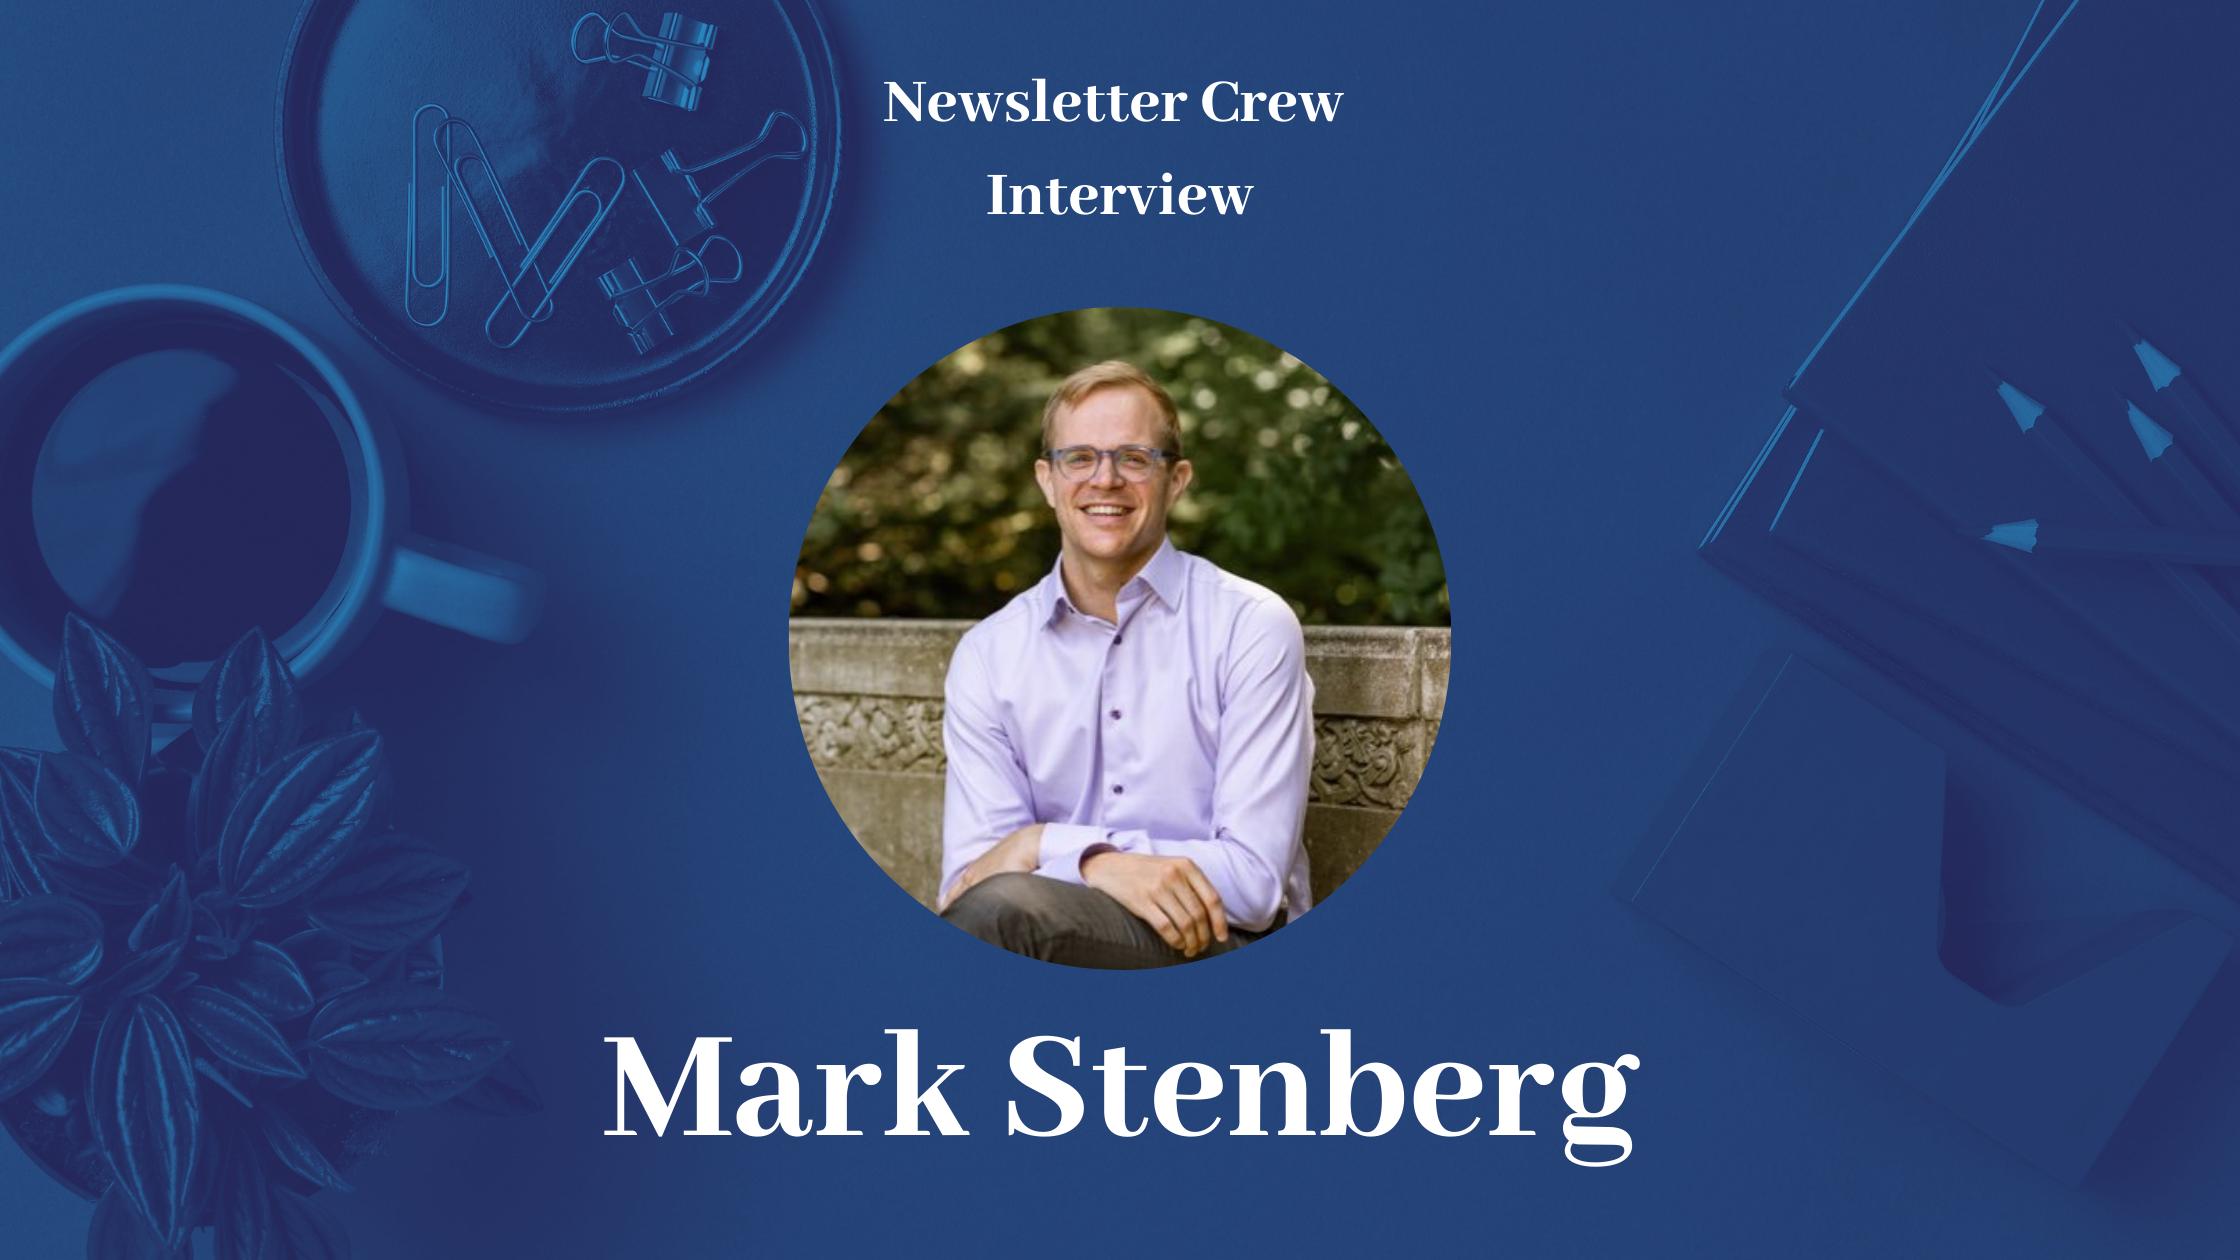 Media gazing with Mark Stenberg